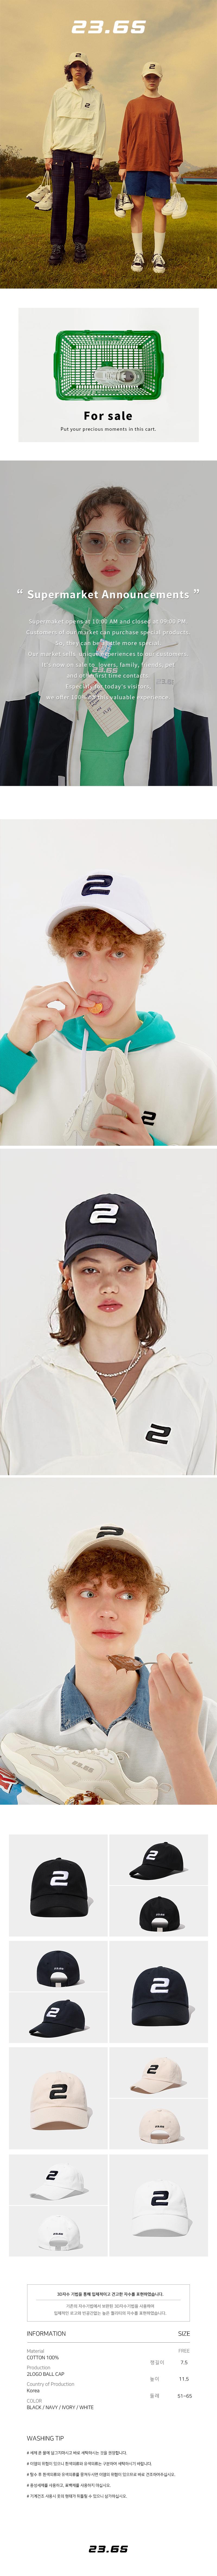 23.65 2LOGO BALL CAP IVORY